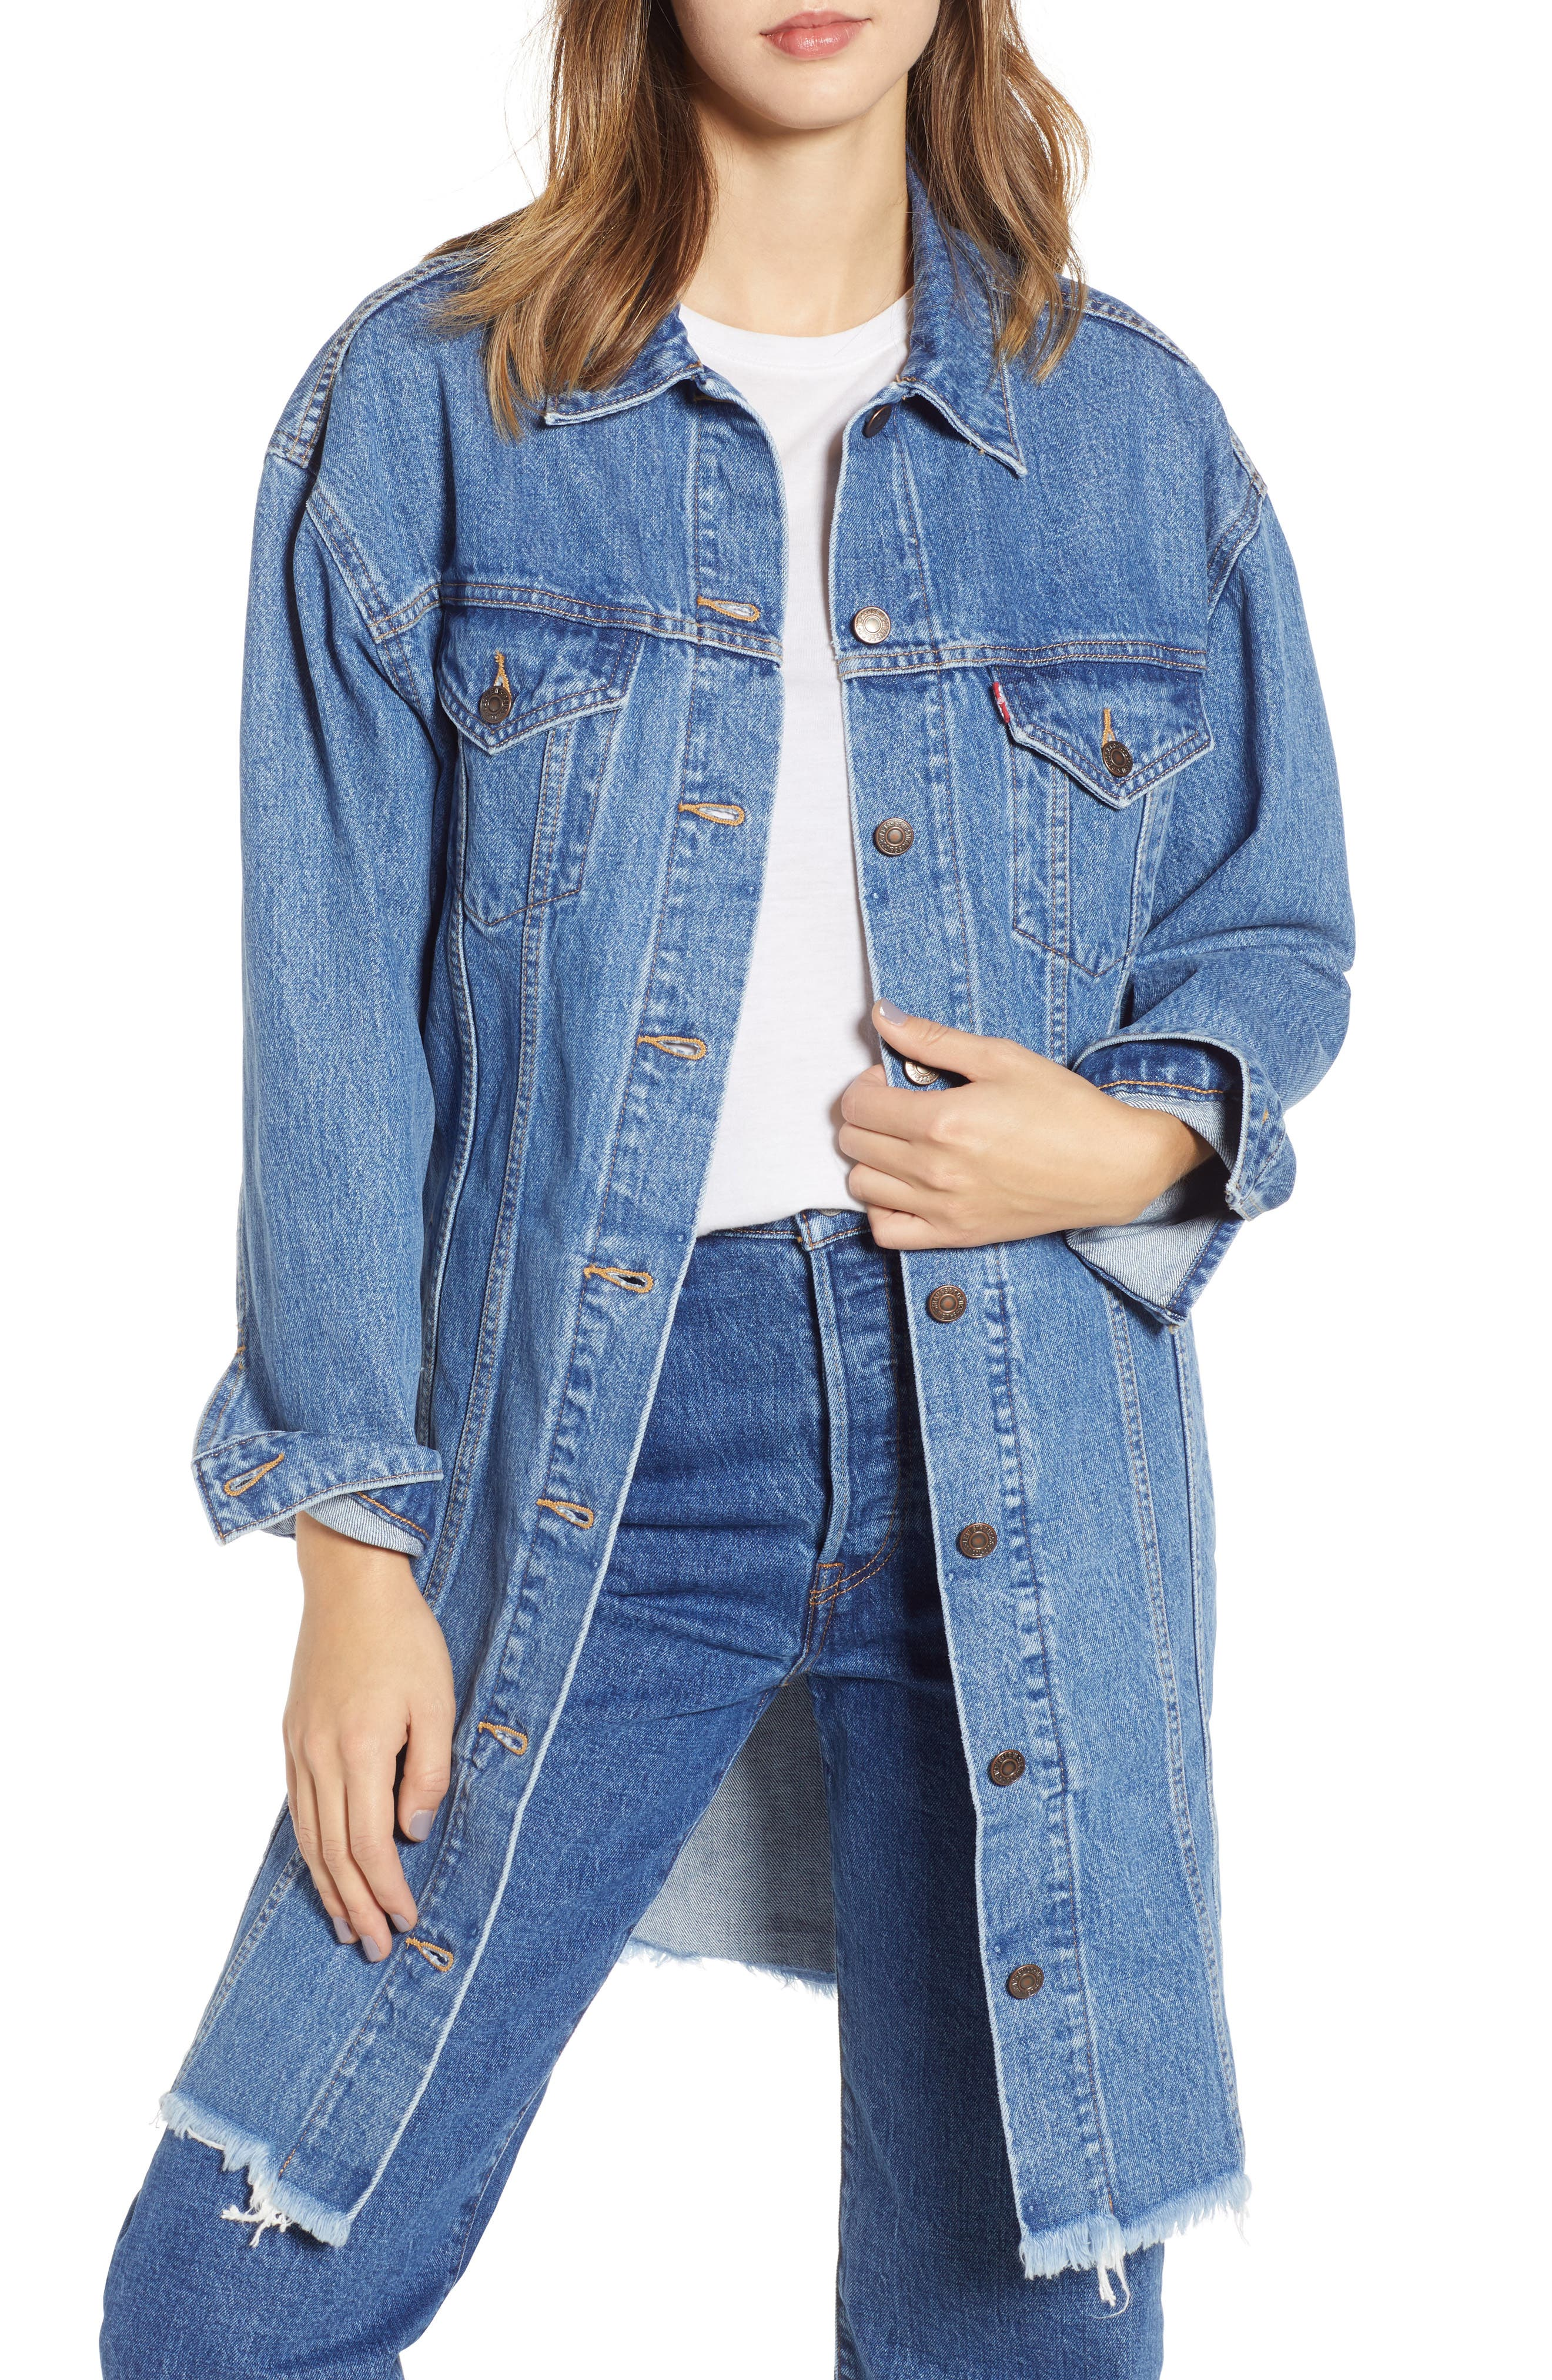 amp; Coats Levi's® Jackets Women's Nordstrom zYXw5x